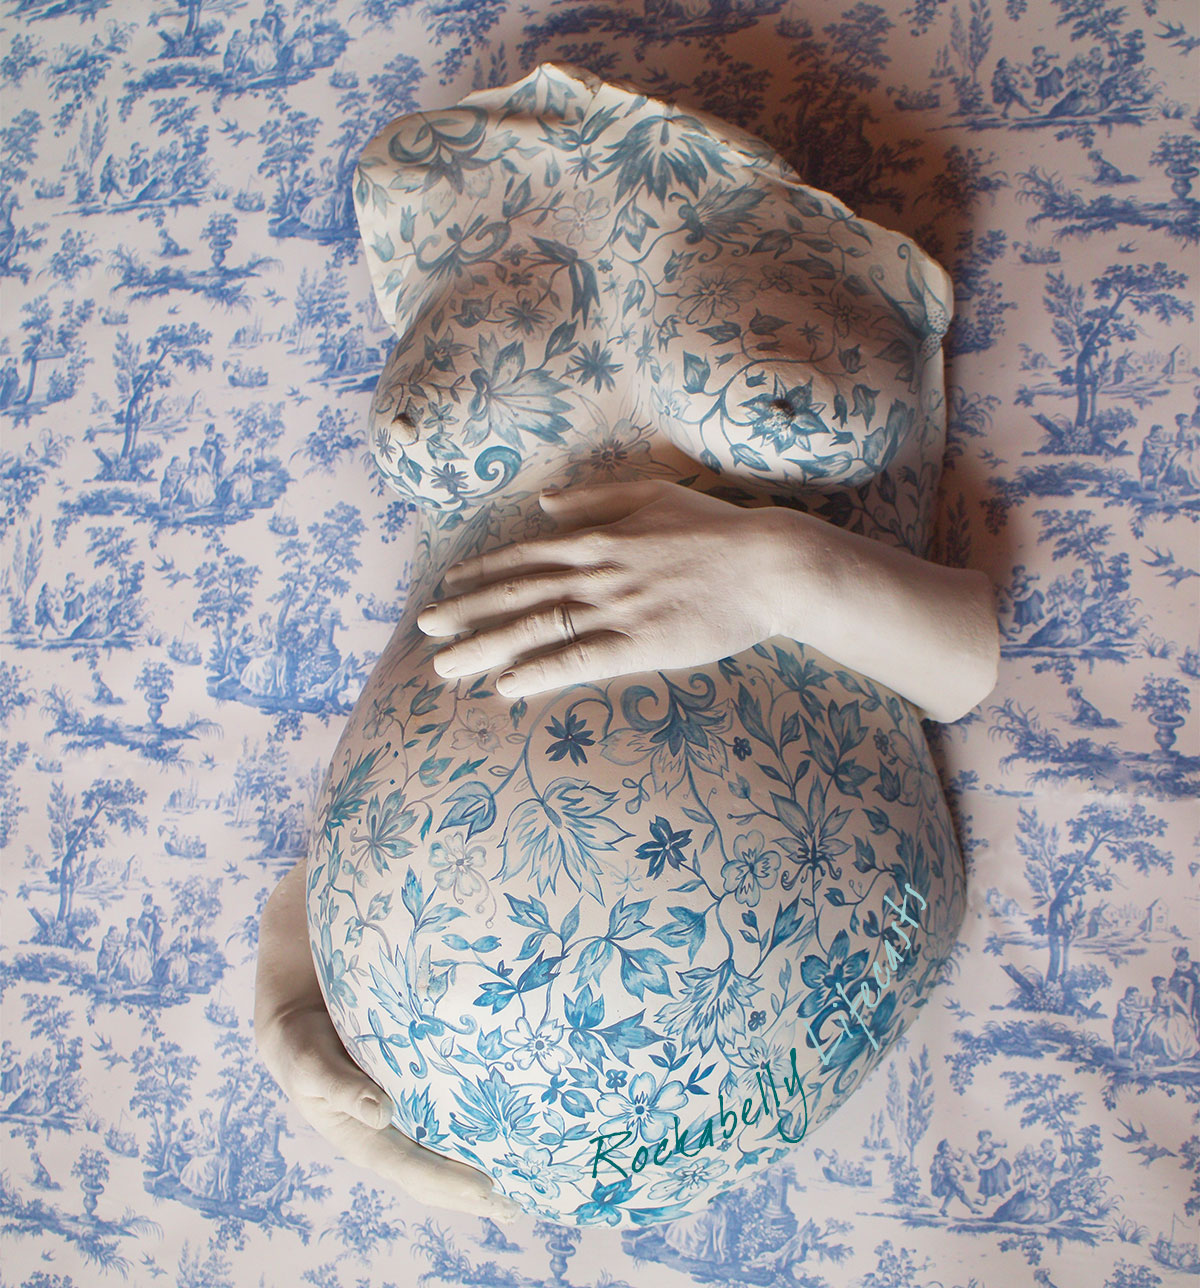 'A Very English Pregnancy' - handpainted pre-natal cast by CJ Munn